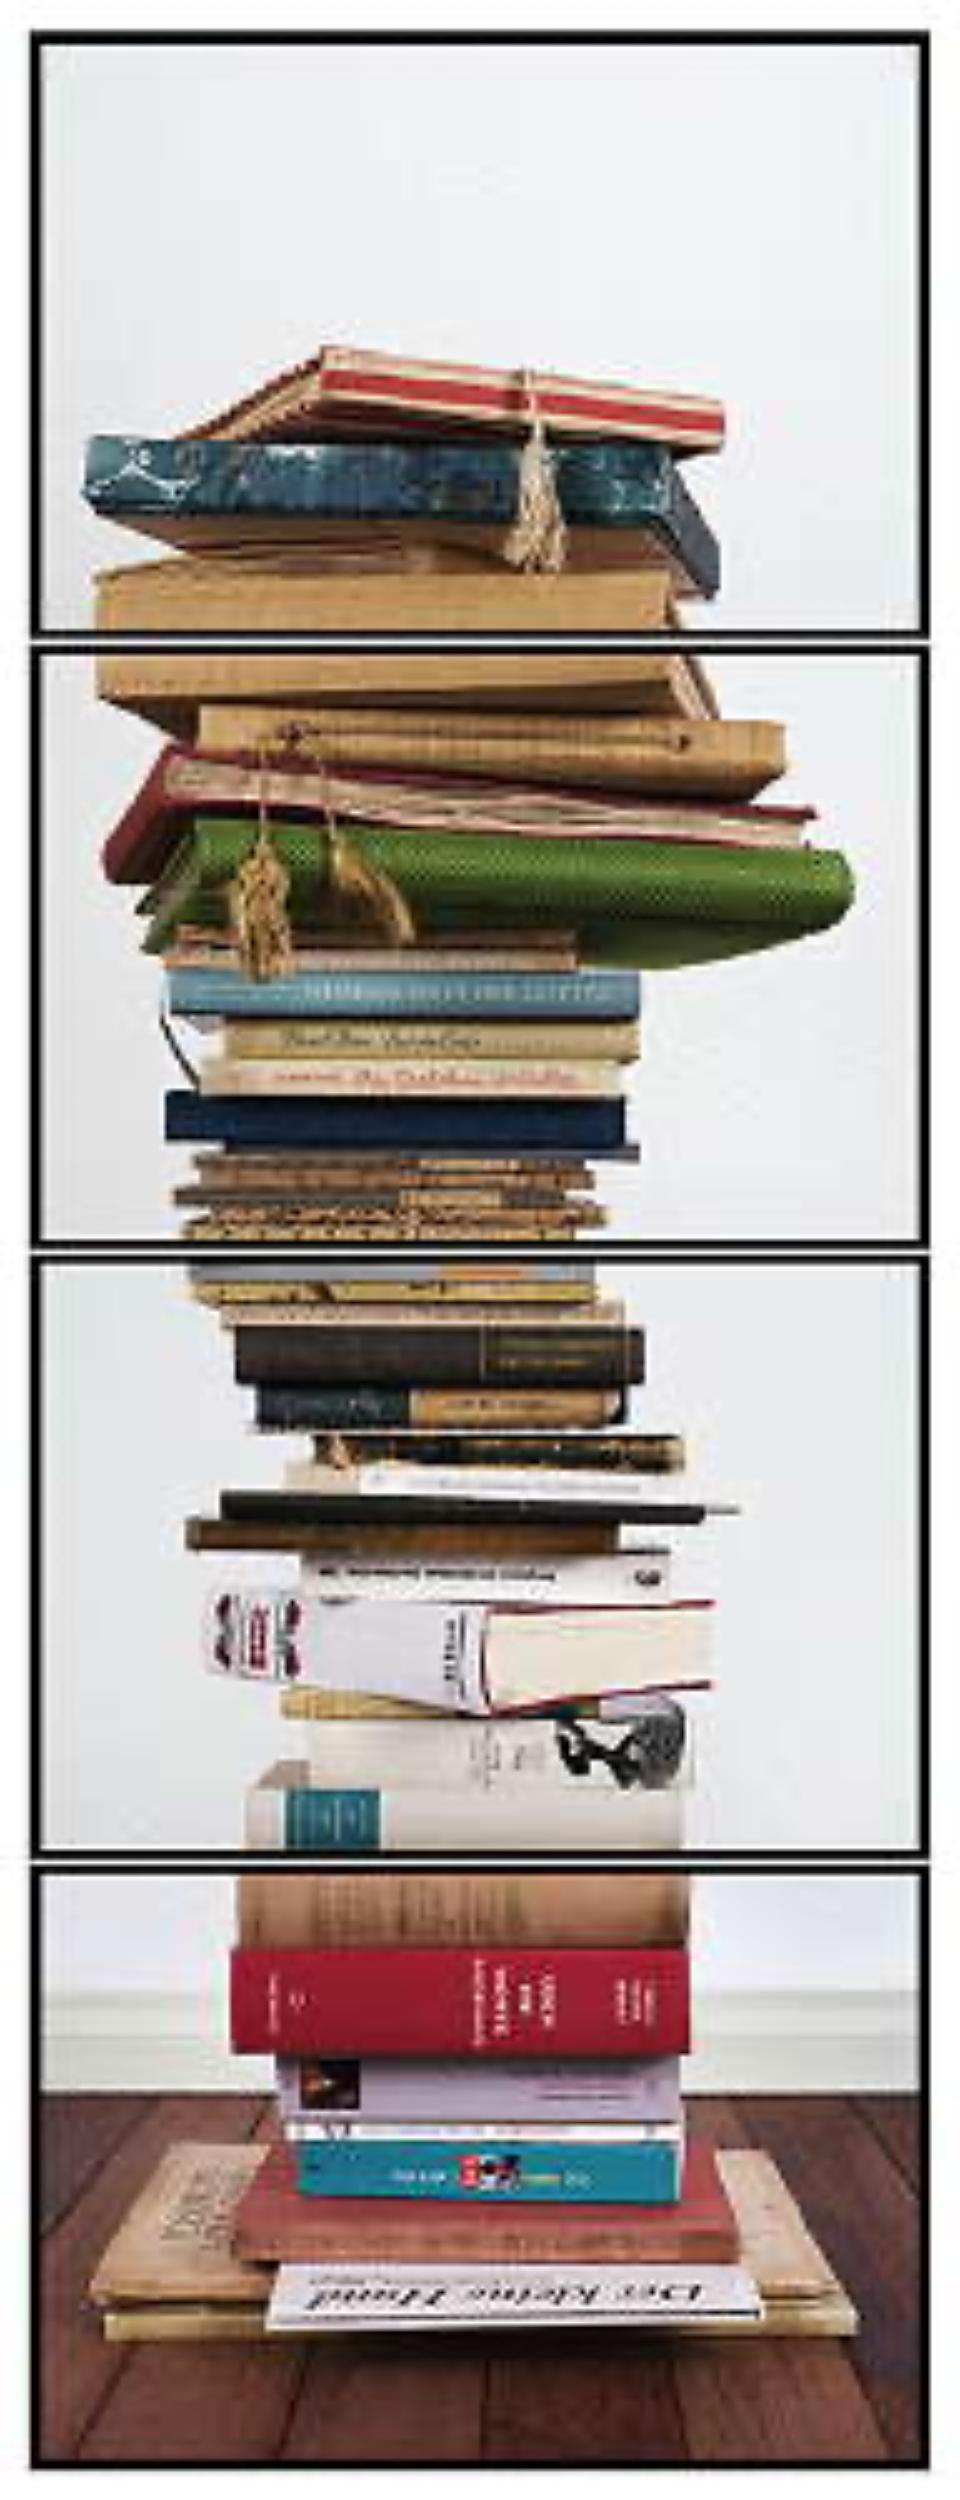 Joachim Froese: Critical Mass #5 2008 4 archival pigment inkjet prints 124 x 46 cm Ed. 12